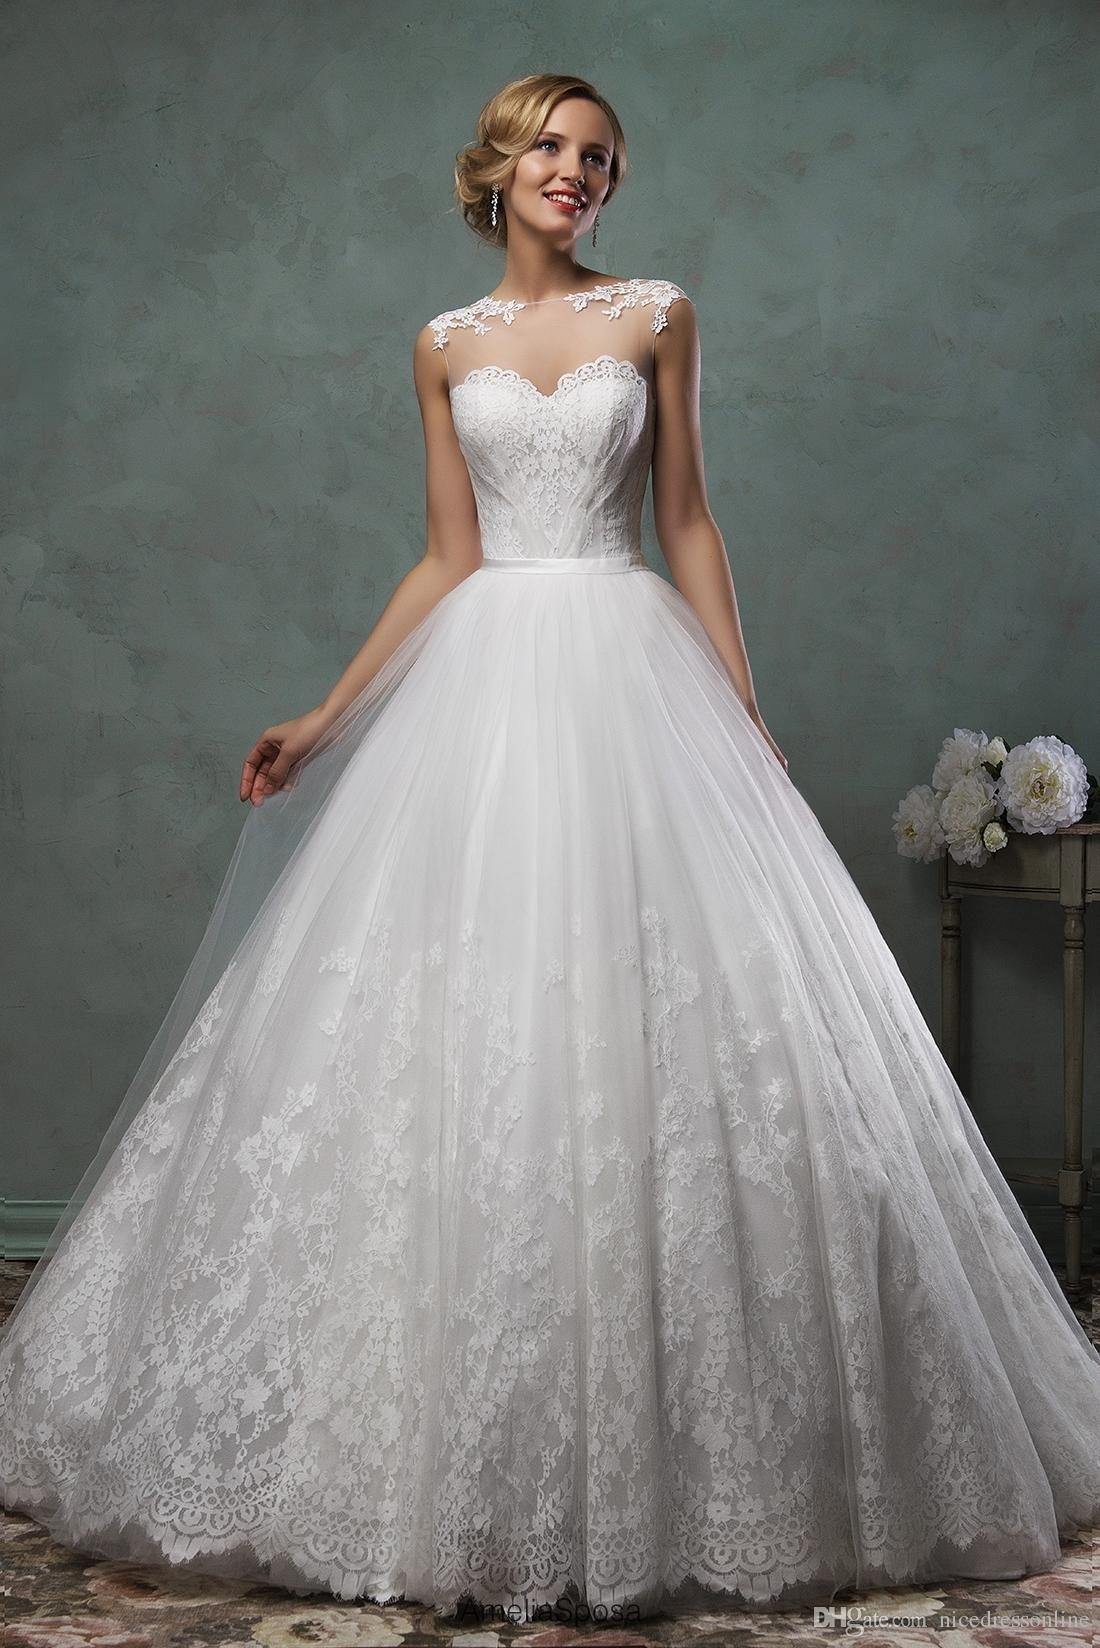 af2939da275 Bridesmaid Dresses Online Shopping - Gomes Weine AG